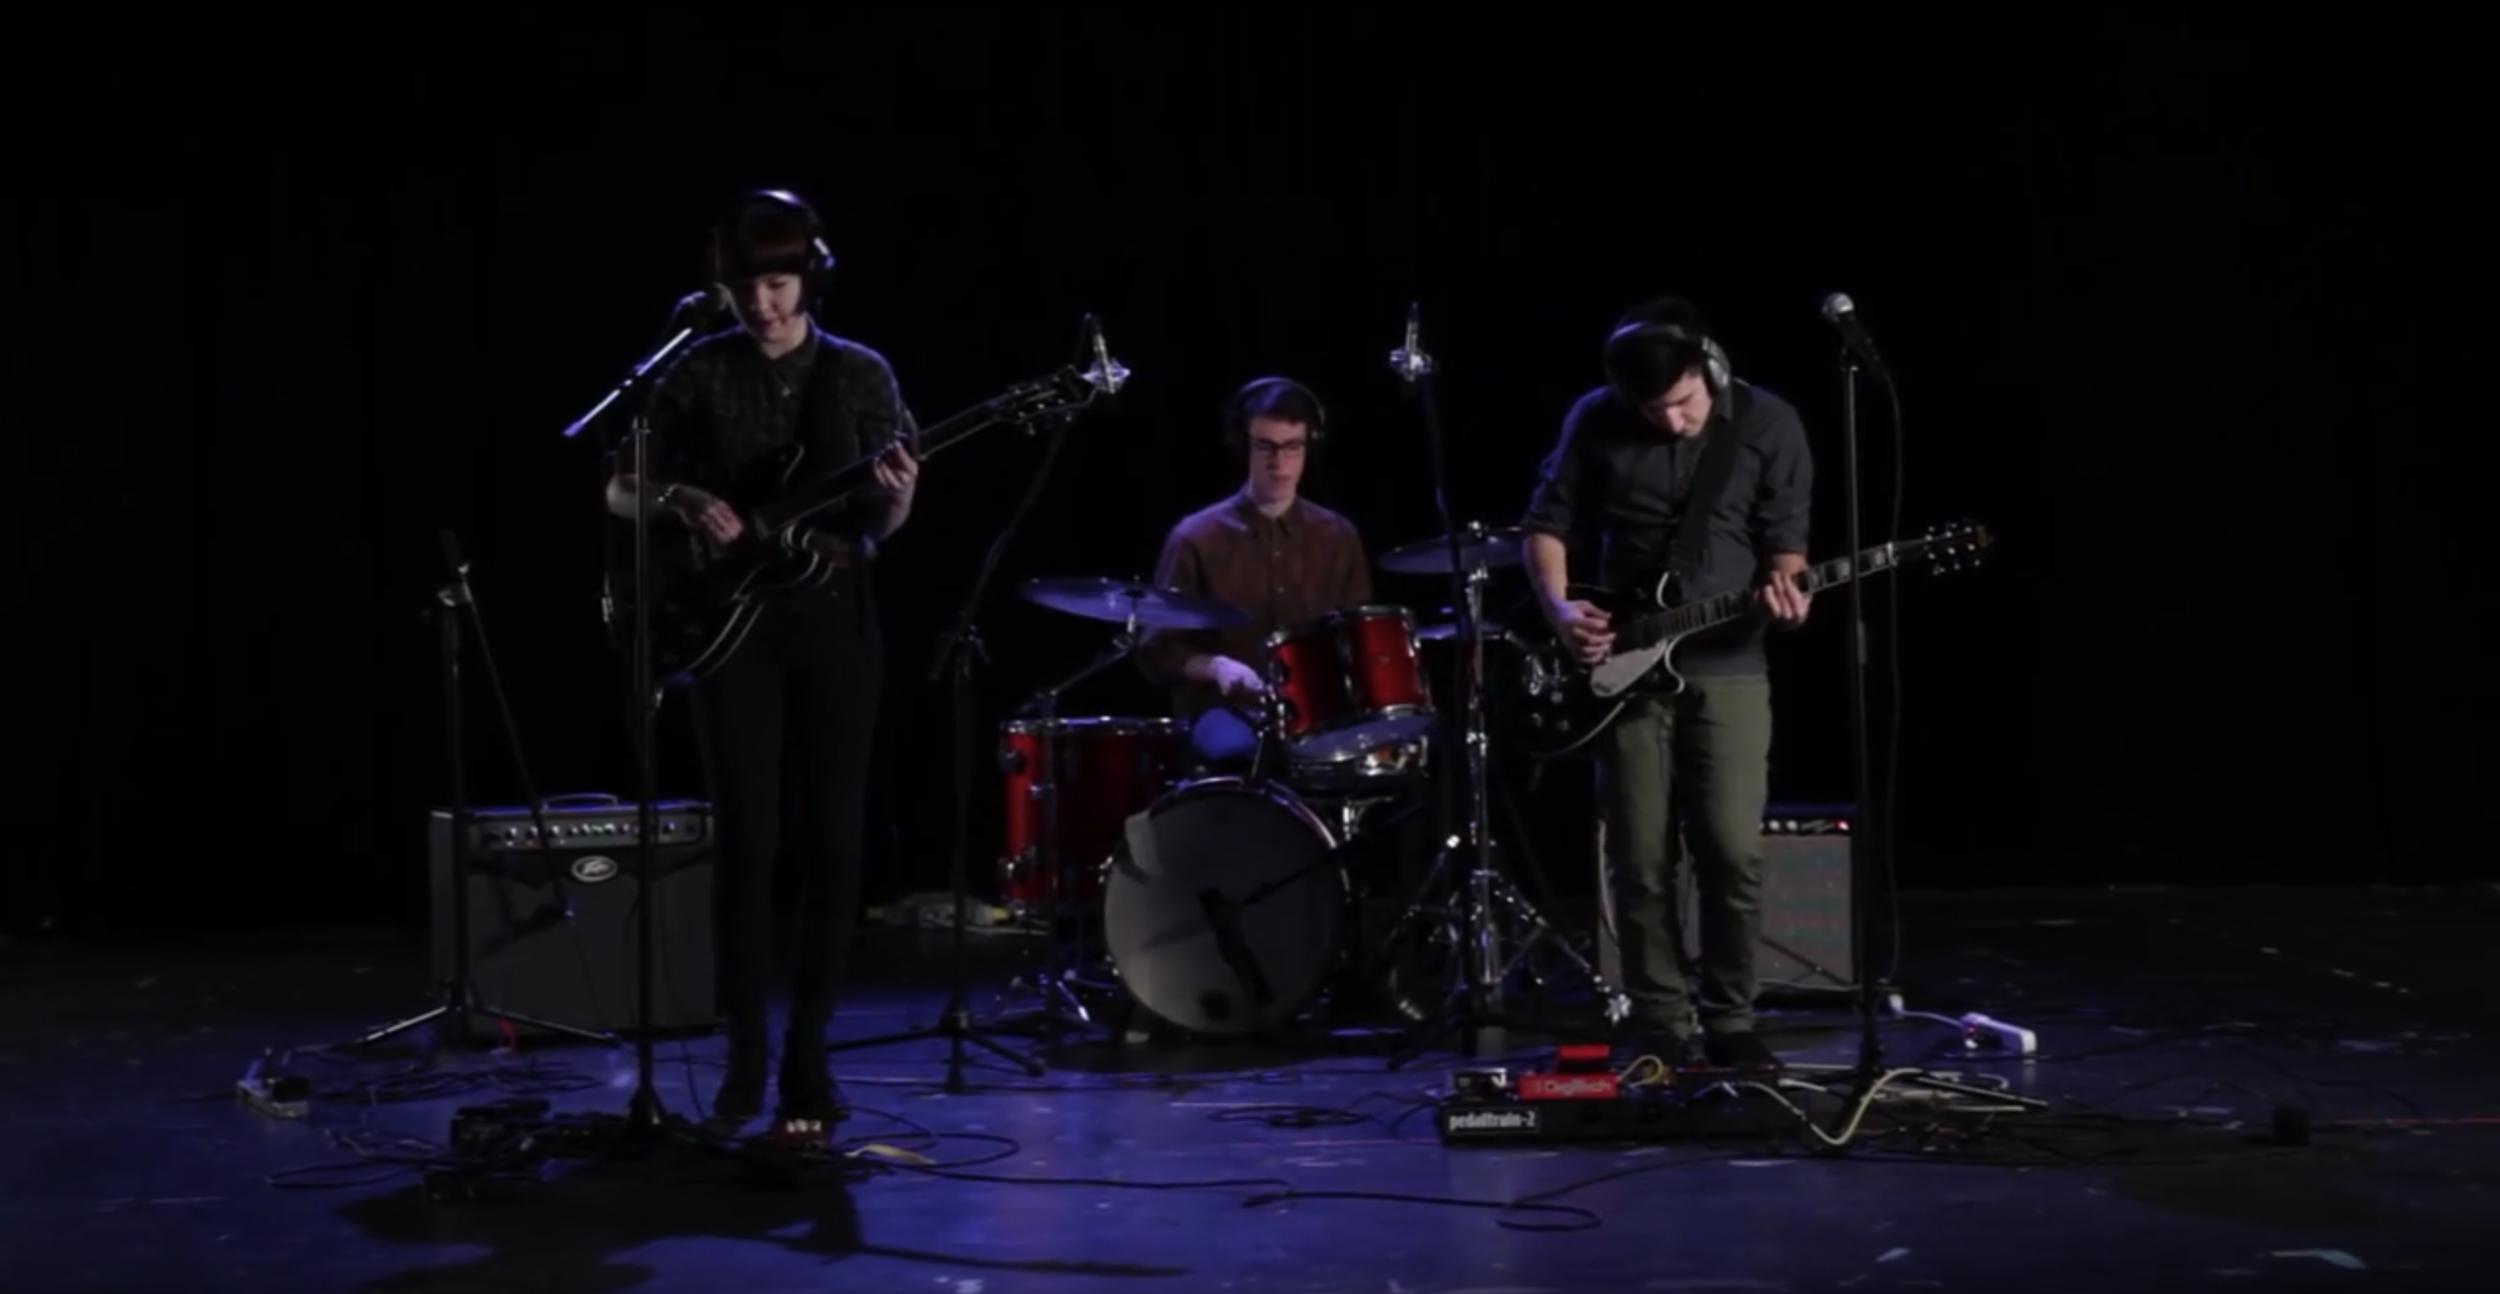 DOUSE - LANCASTER - 2014 /Live Performance Video / Indie Rock / 4mins